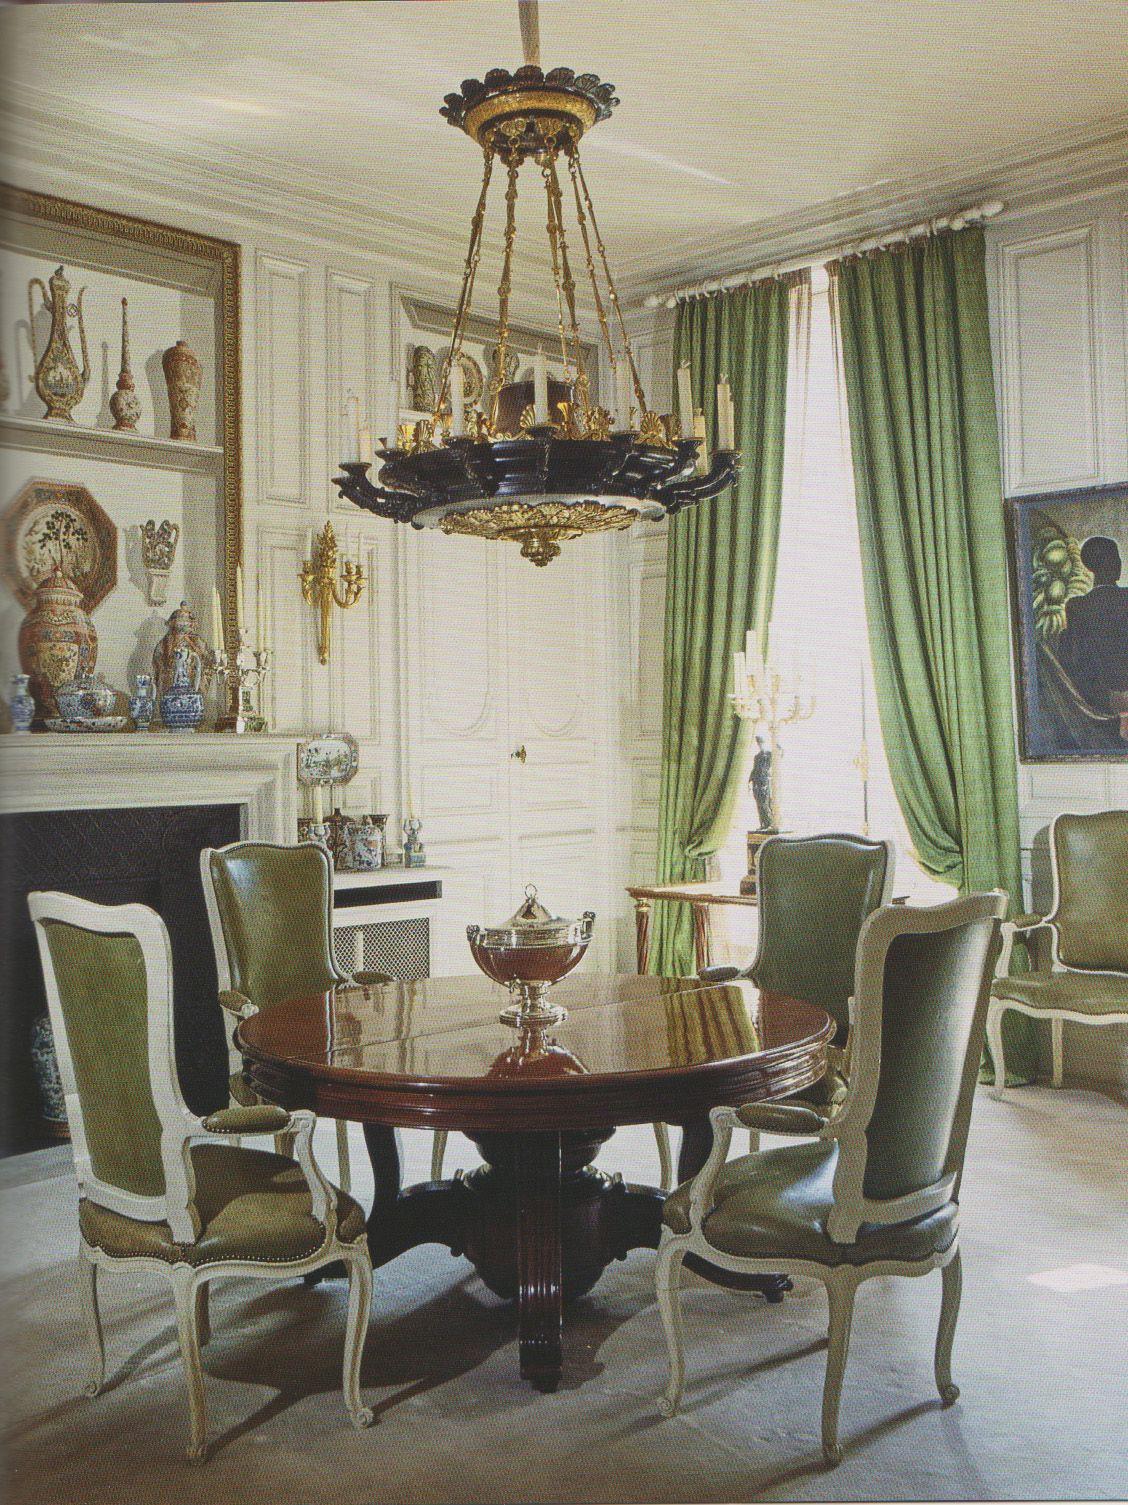 Dining Room Paris home of Helene Rochas 6a341d5cca